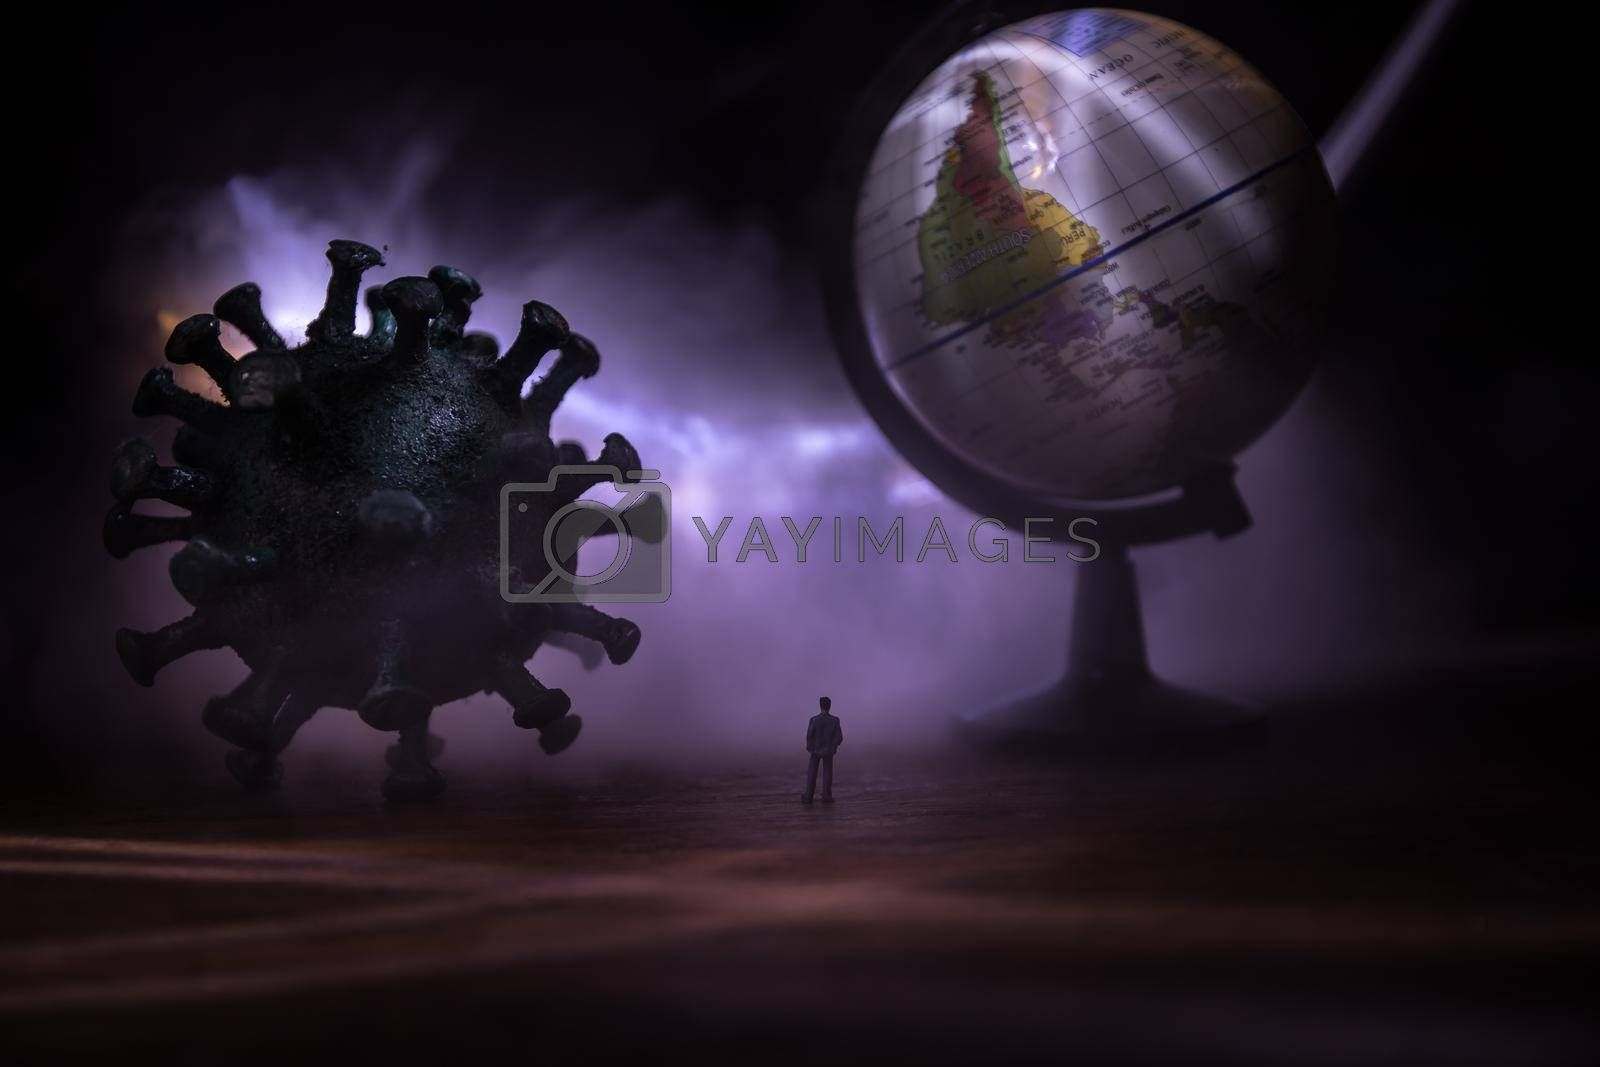 Corona virus global pandemic concept. Miniature man standing near big Corona virus novel in dark. Creative decoration with fog and backlight. Selective focus